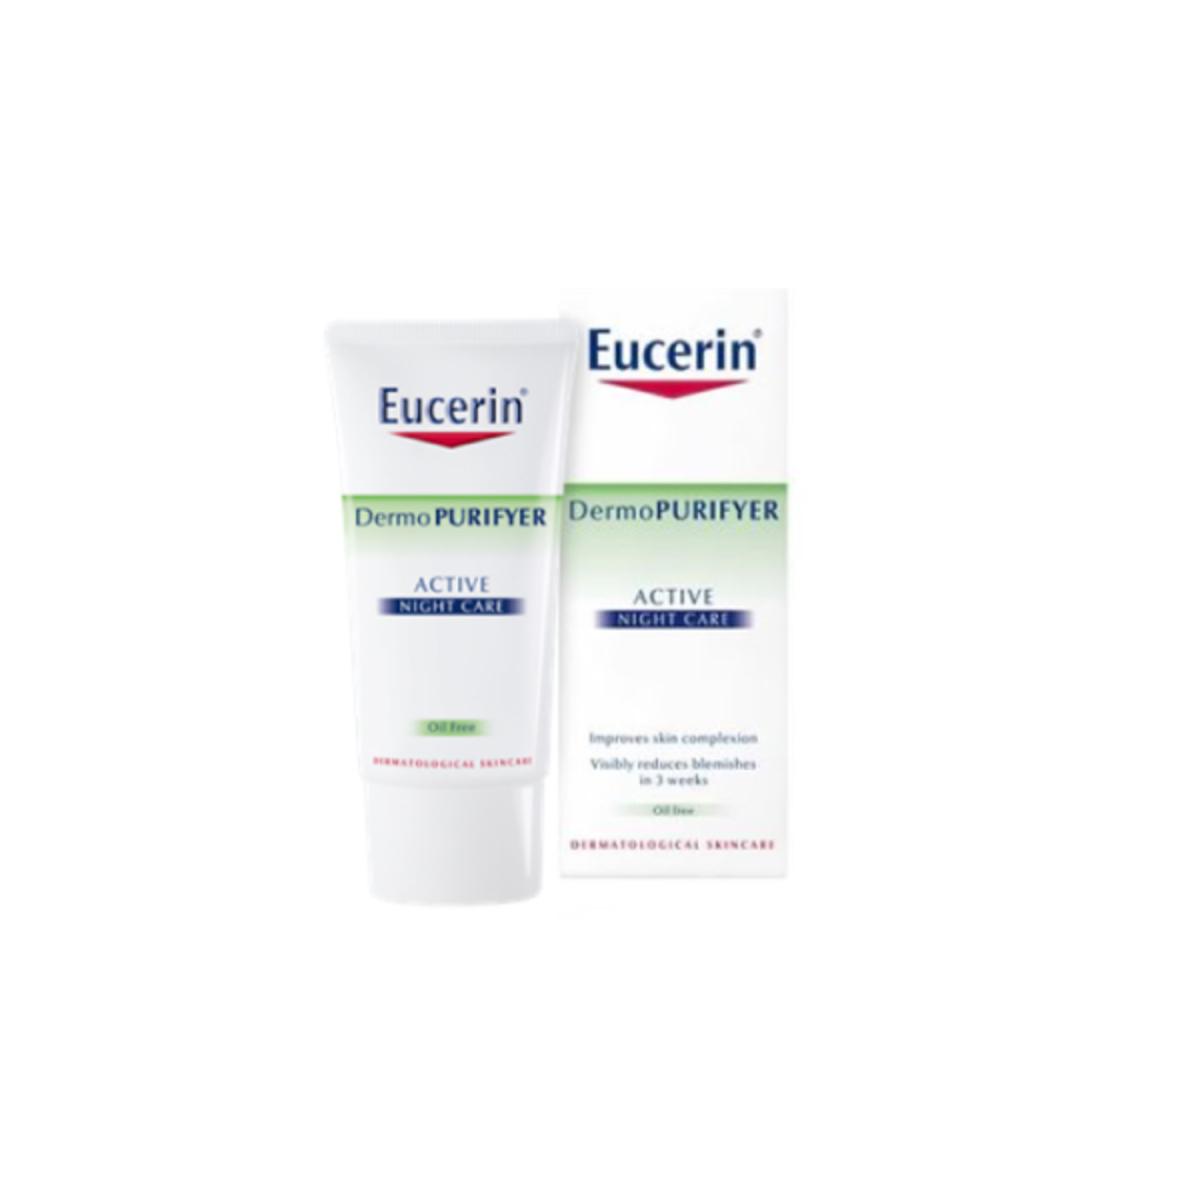 eucerin dermopurifyer hydrating care 50ml